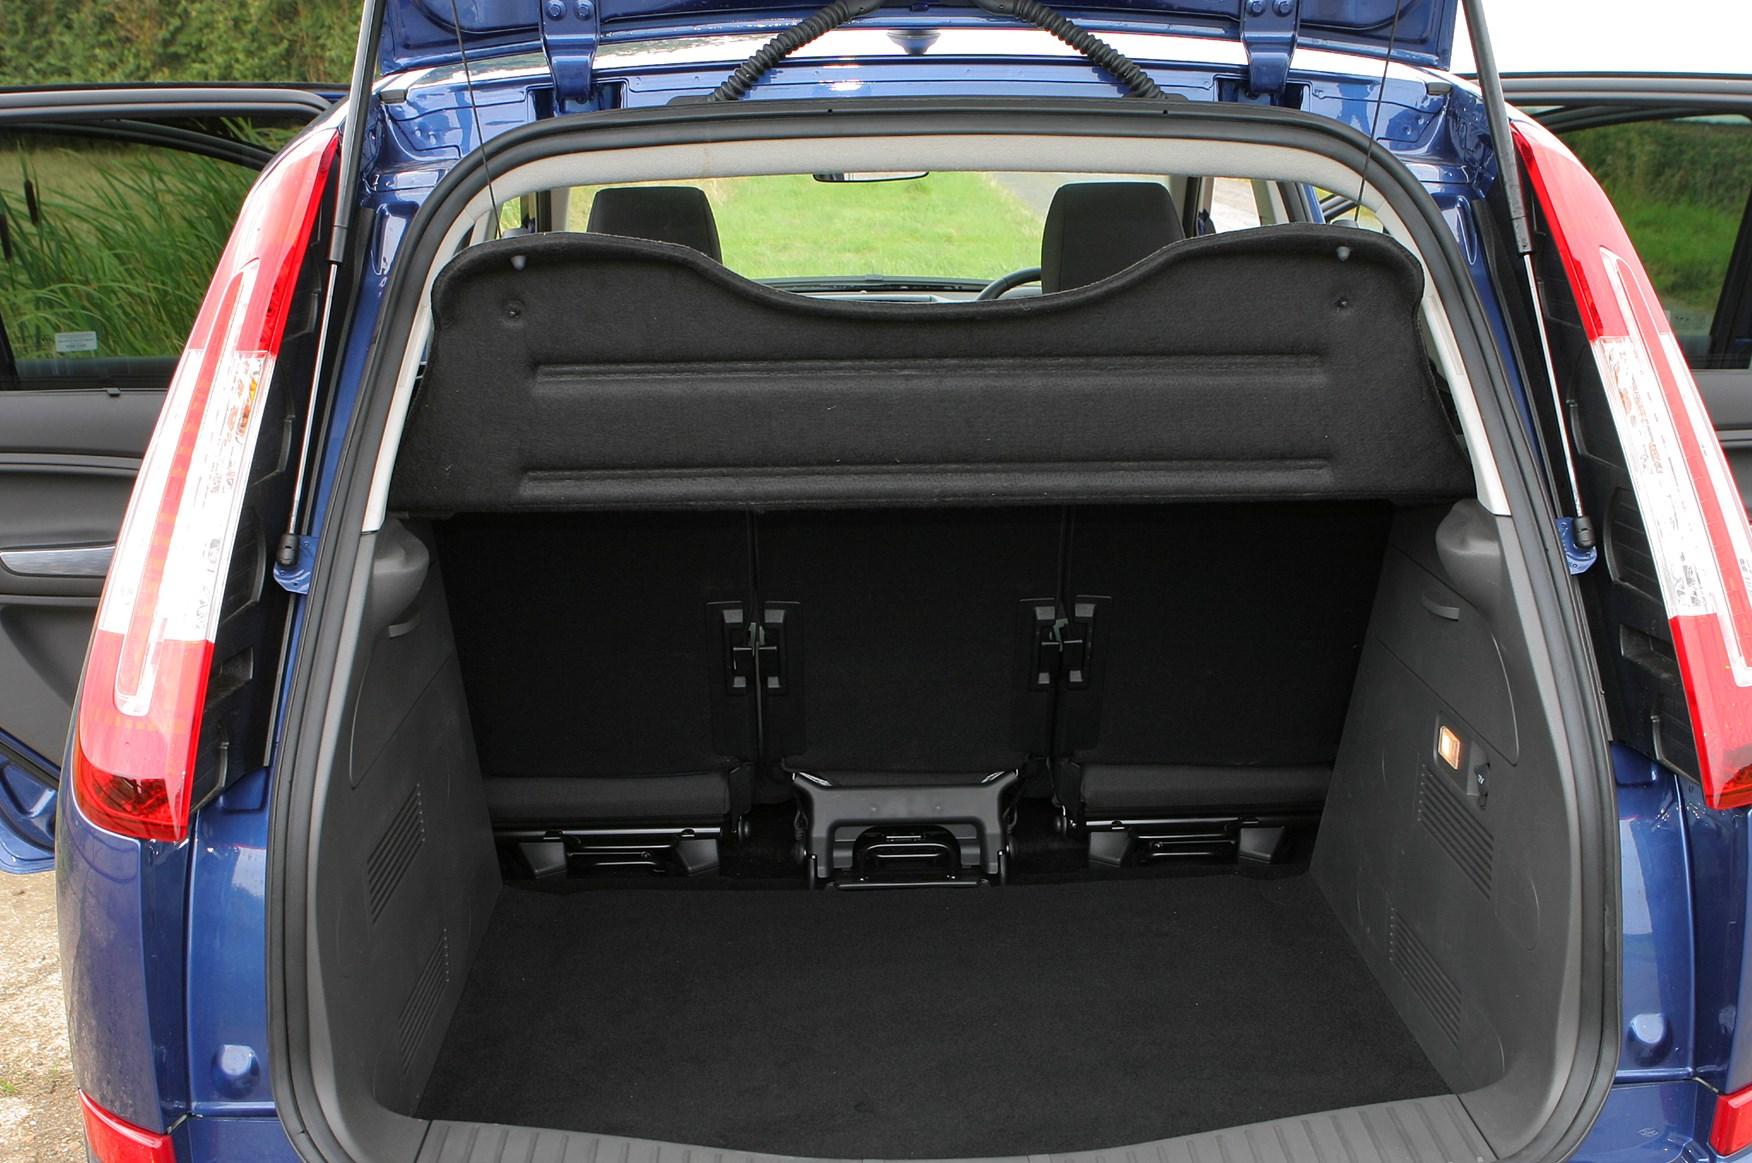 ford focus c max estate review 2003 2010 parkers. Black Bedroom Furniture Sets. Home Design Ideas